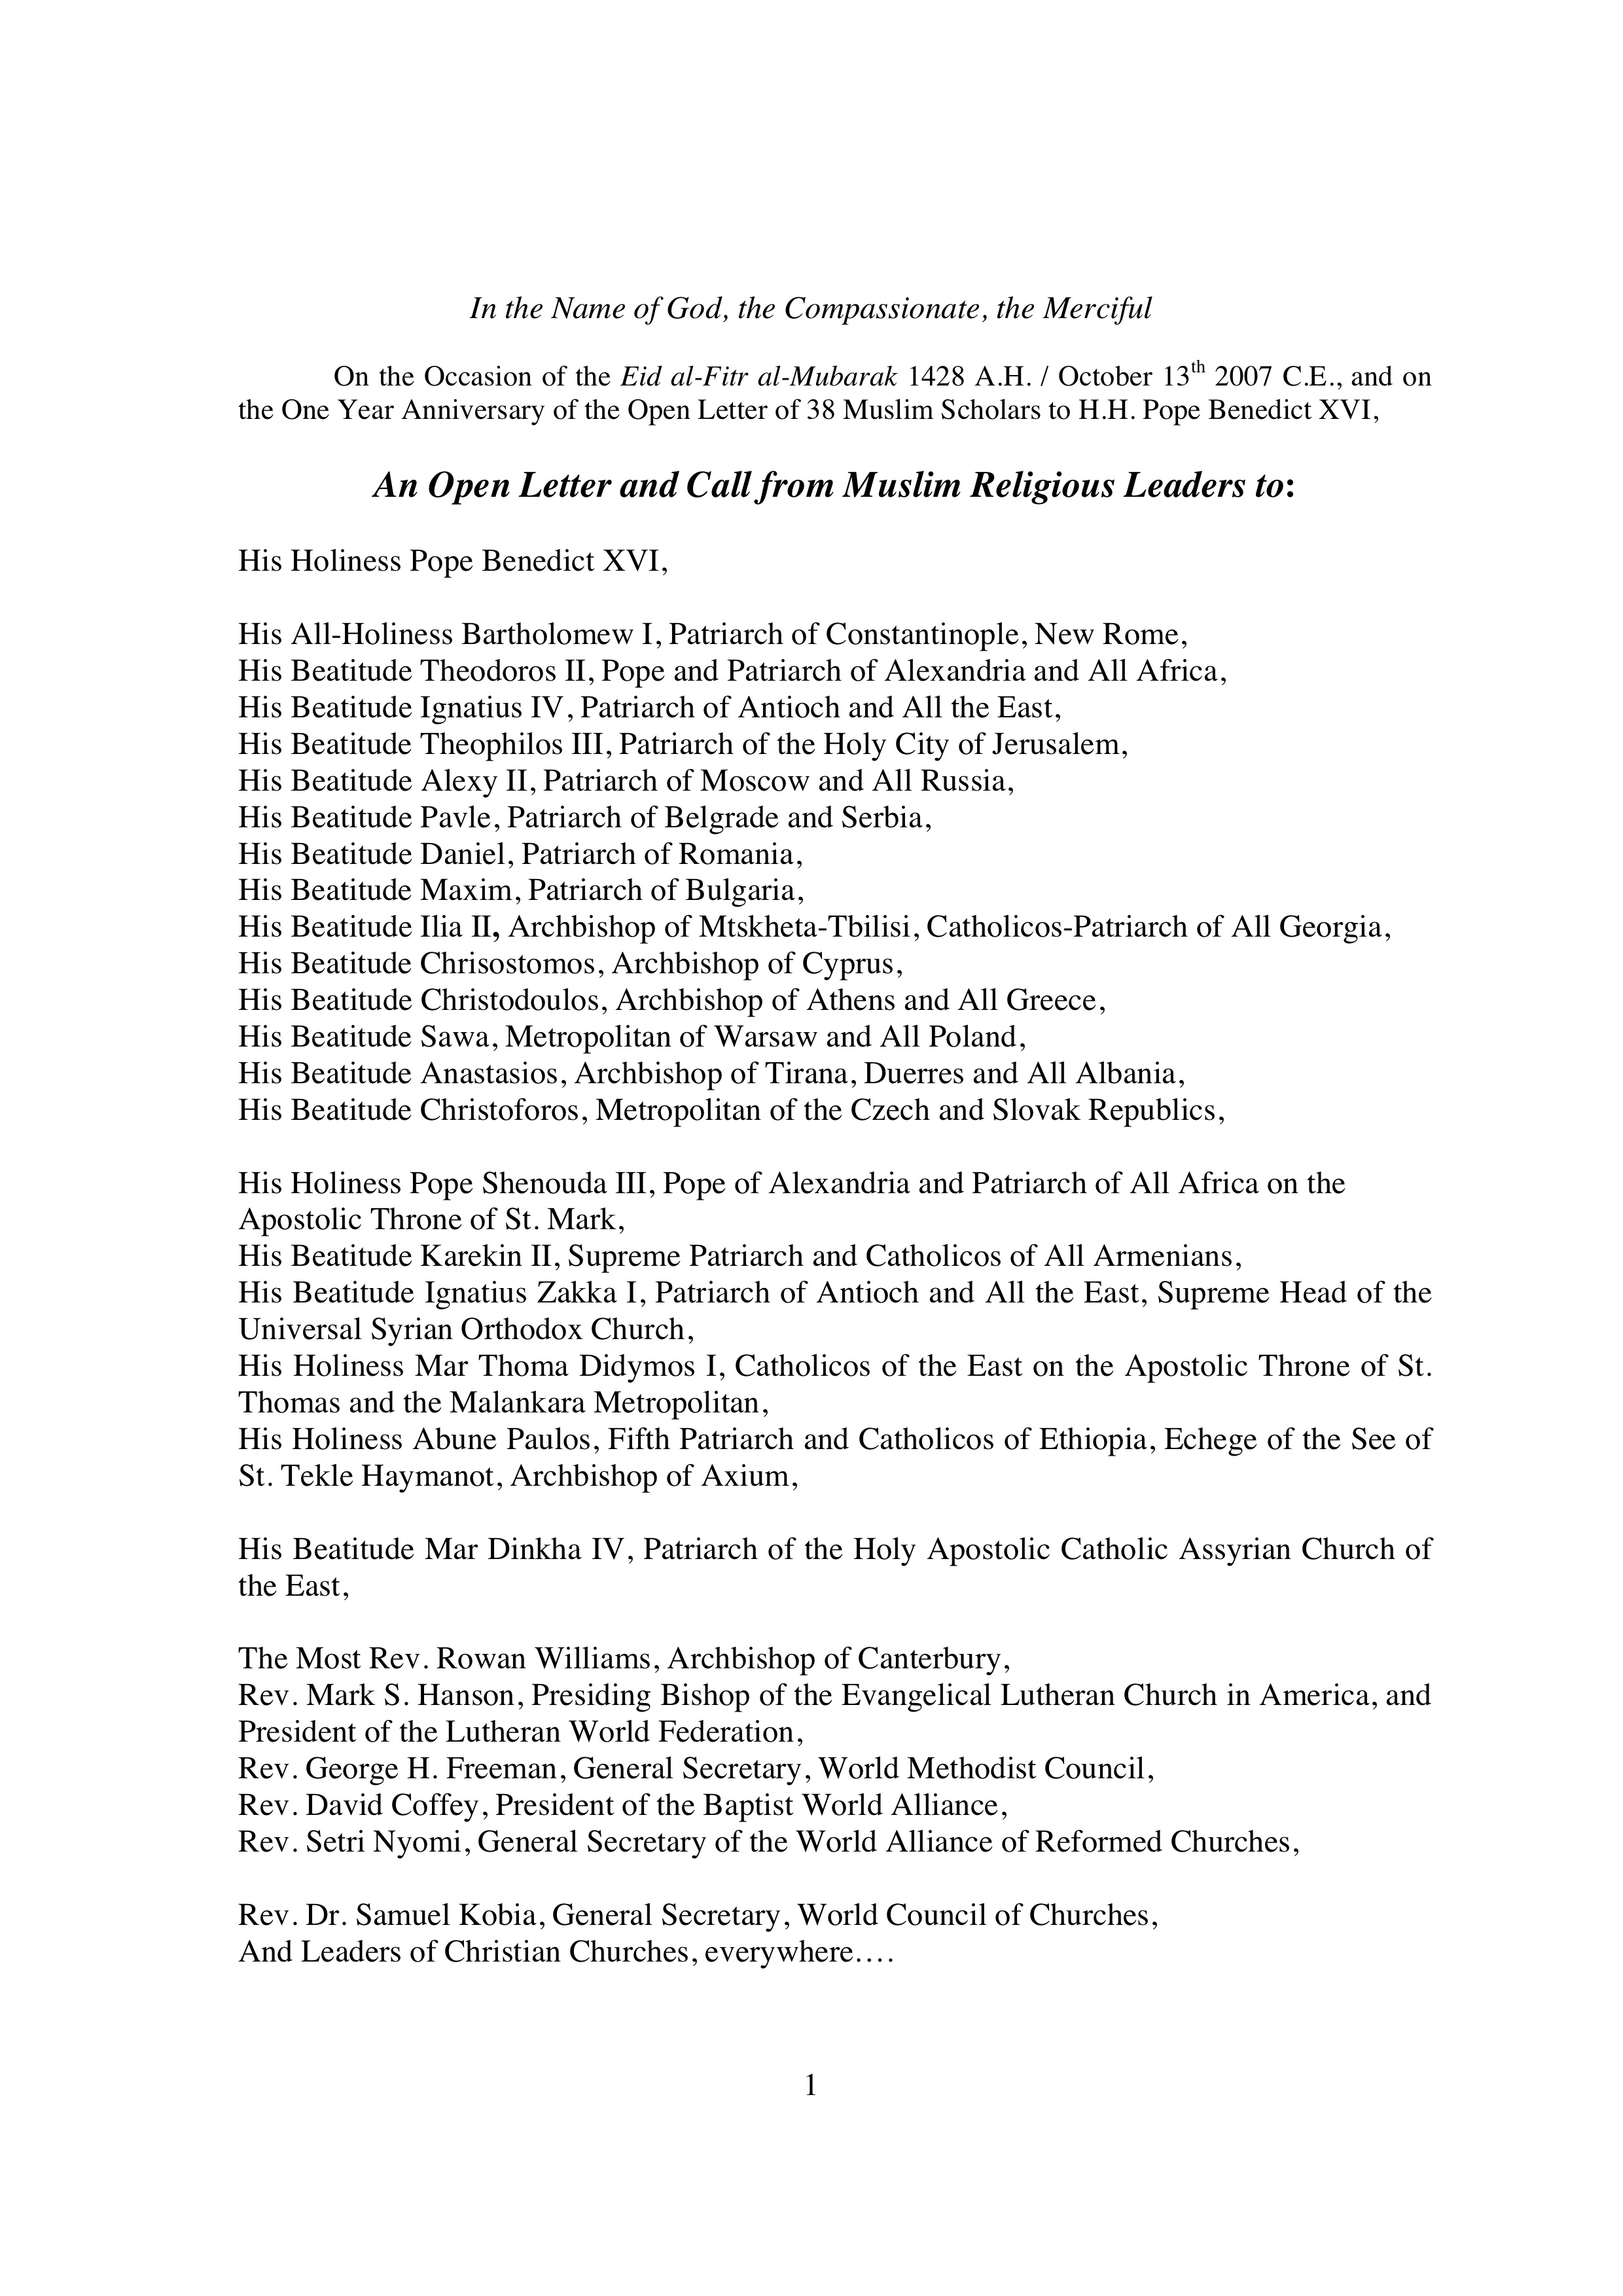 ACW-English-Translation (1) cover.jpg